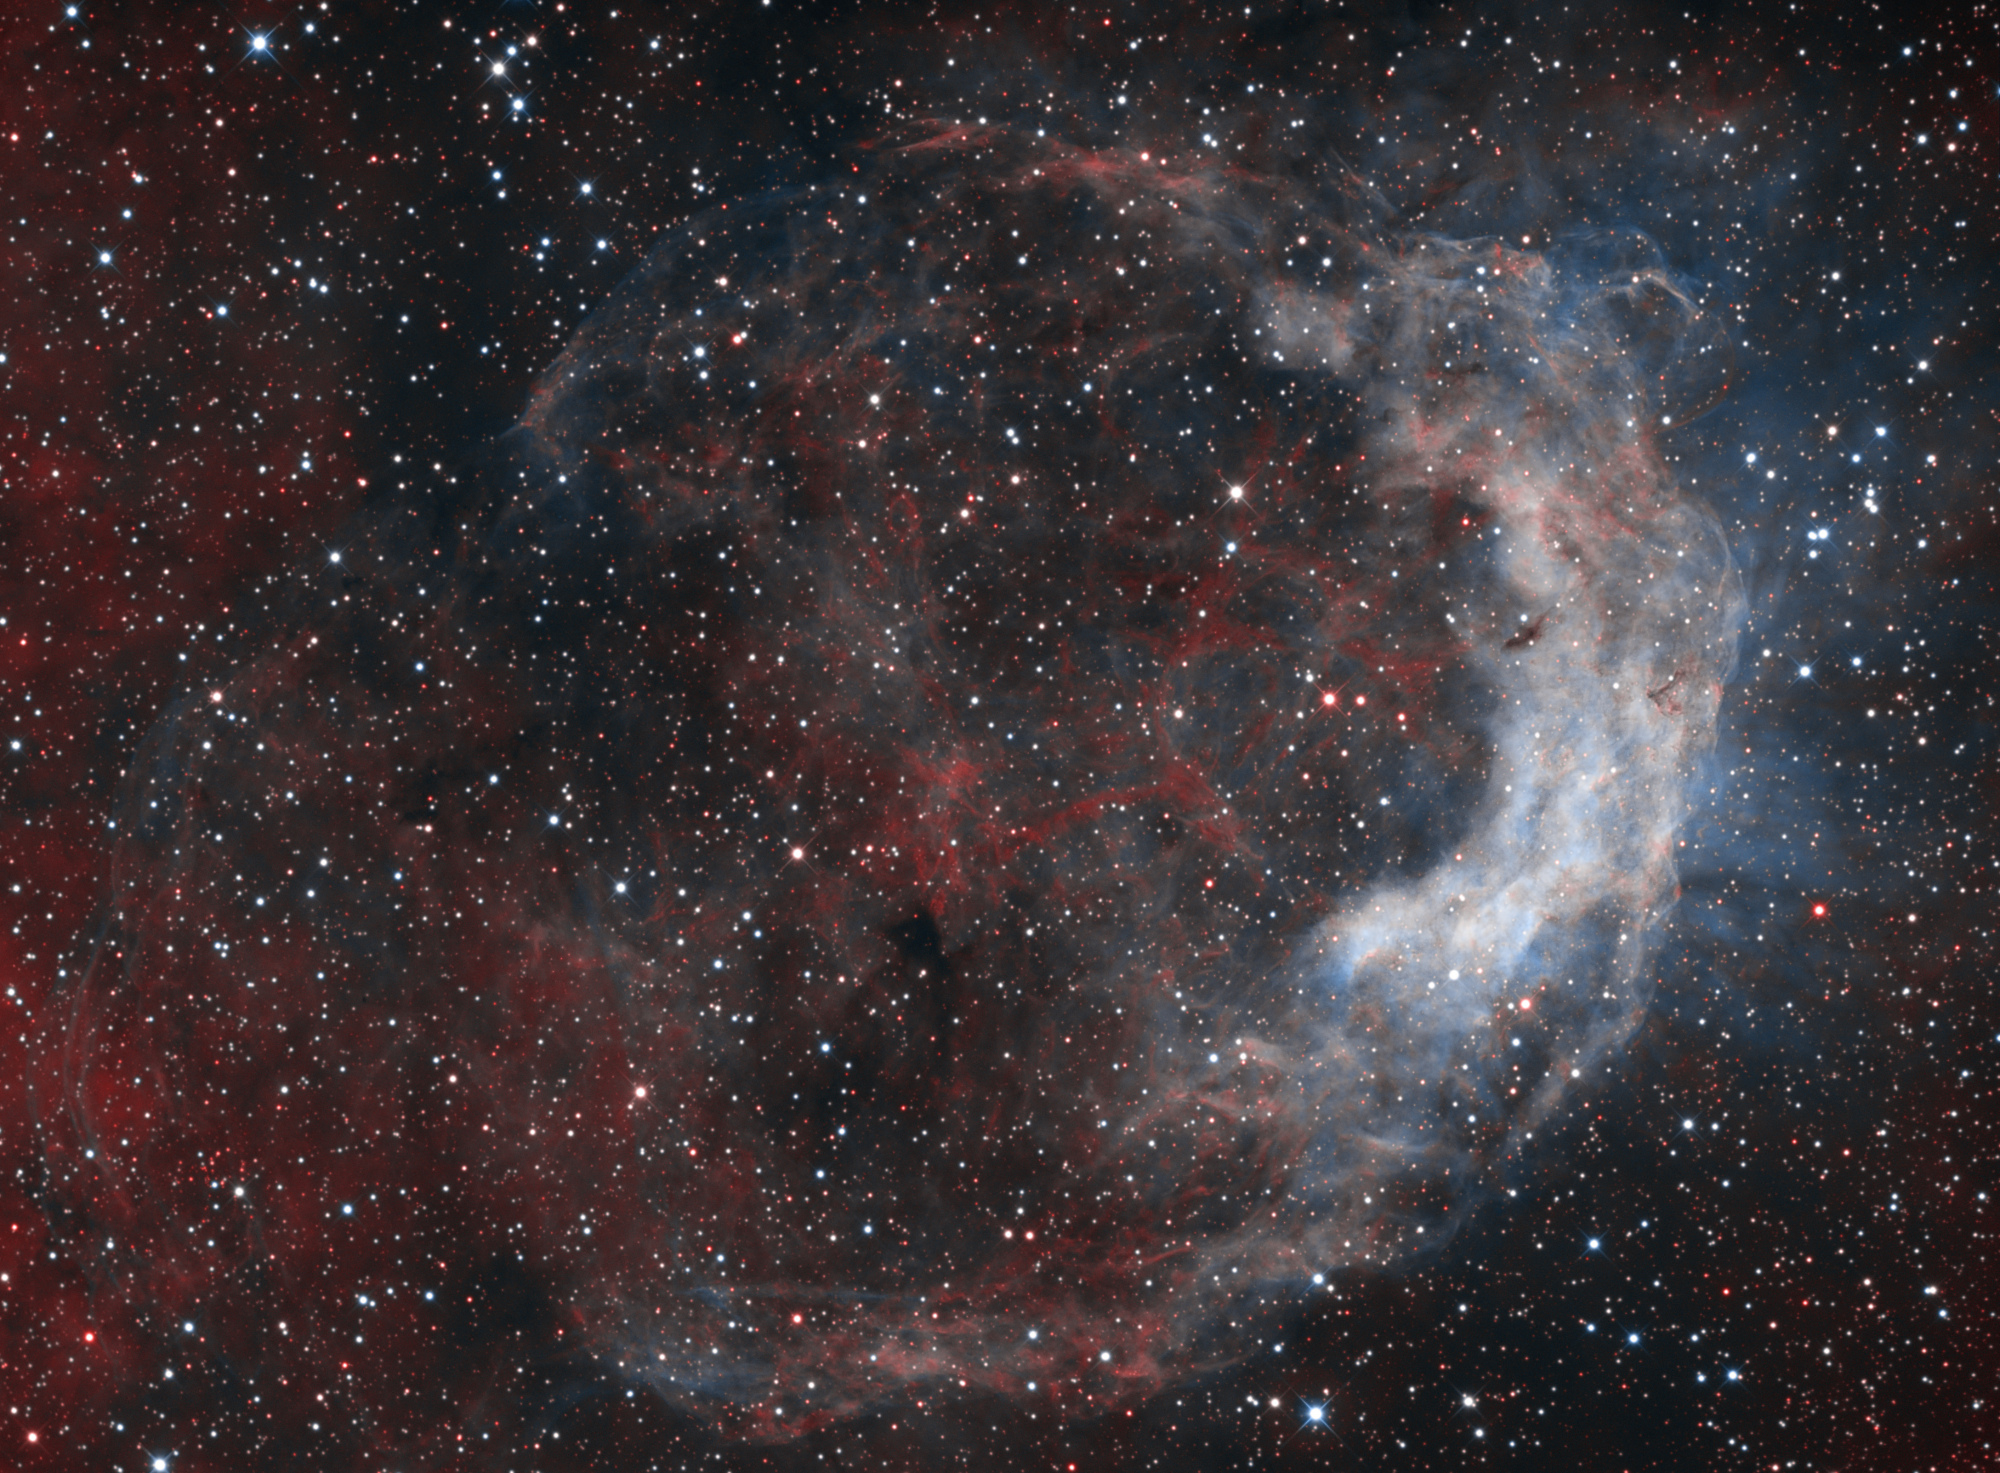 NGC3199-HaOIIIOIII-V41.thumb.jpg.95c4fd28a80f2c59793521ca96817b32.jpg